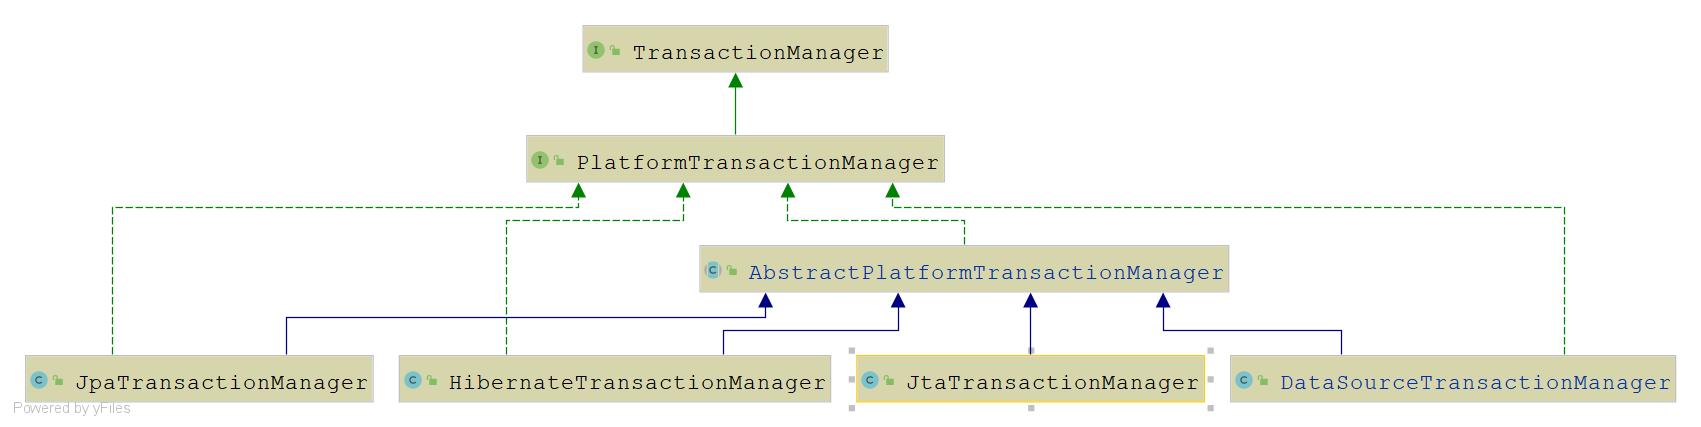 PlatformTransactionManager